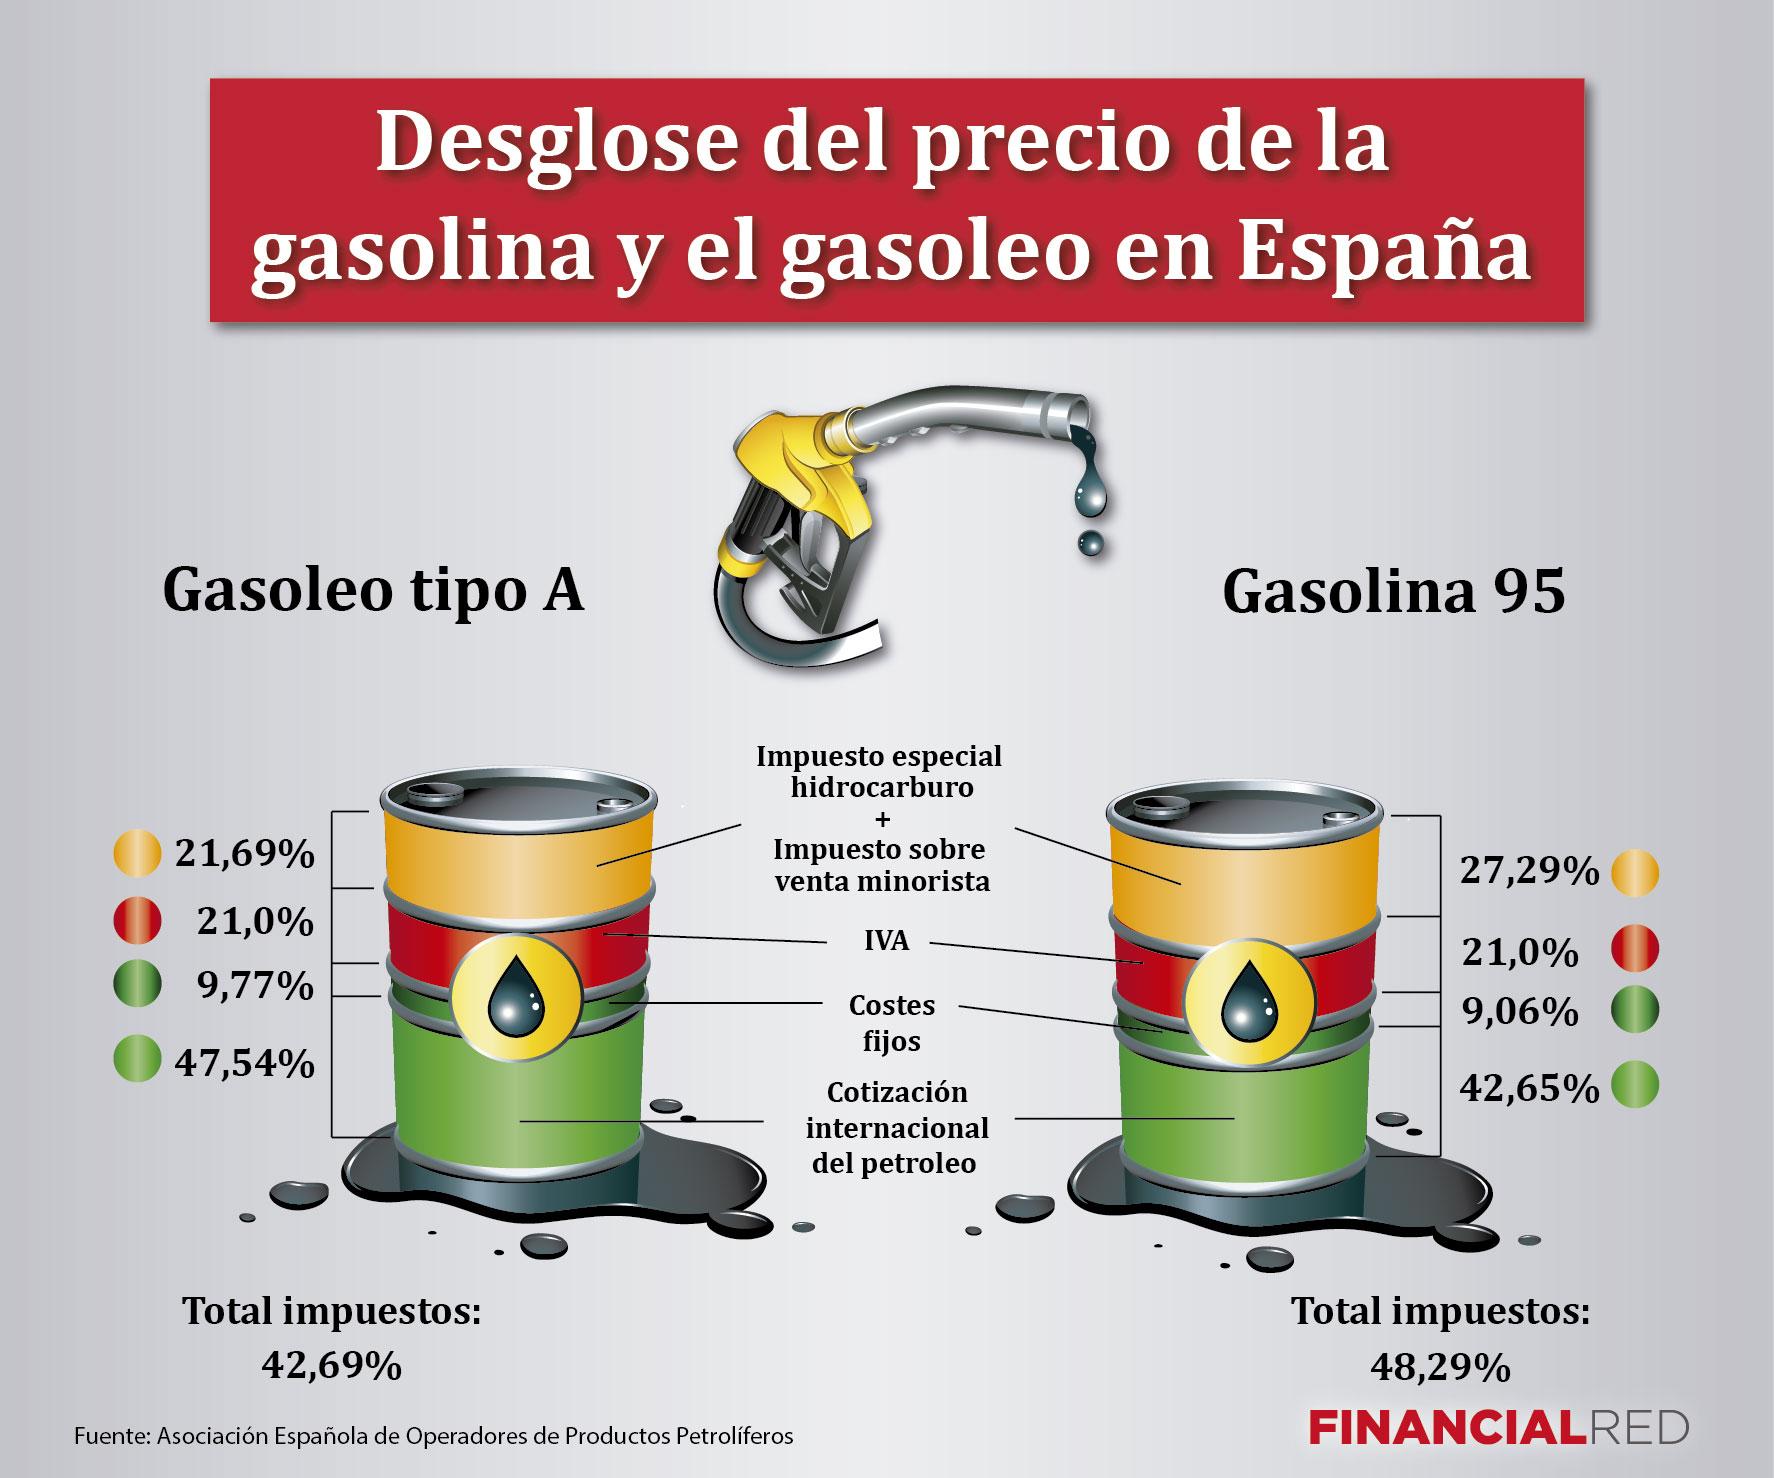 El interruptor del gas a la gasolina la gacela